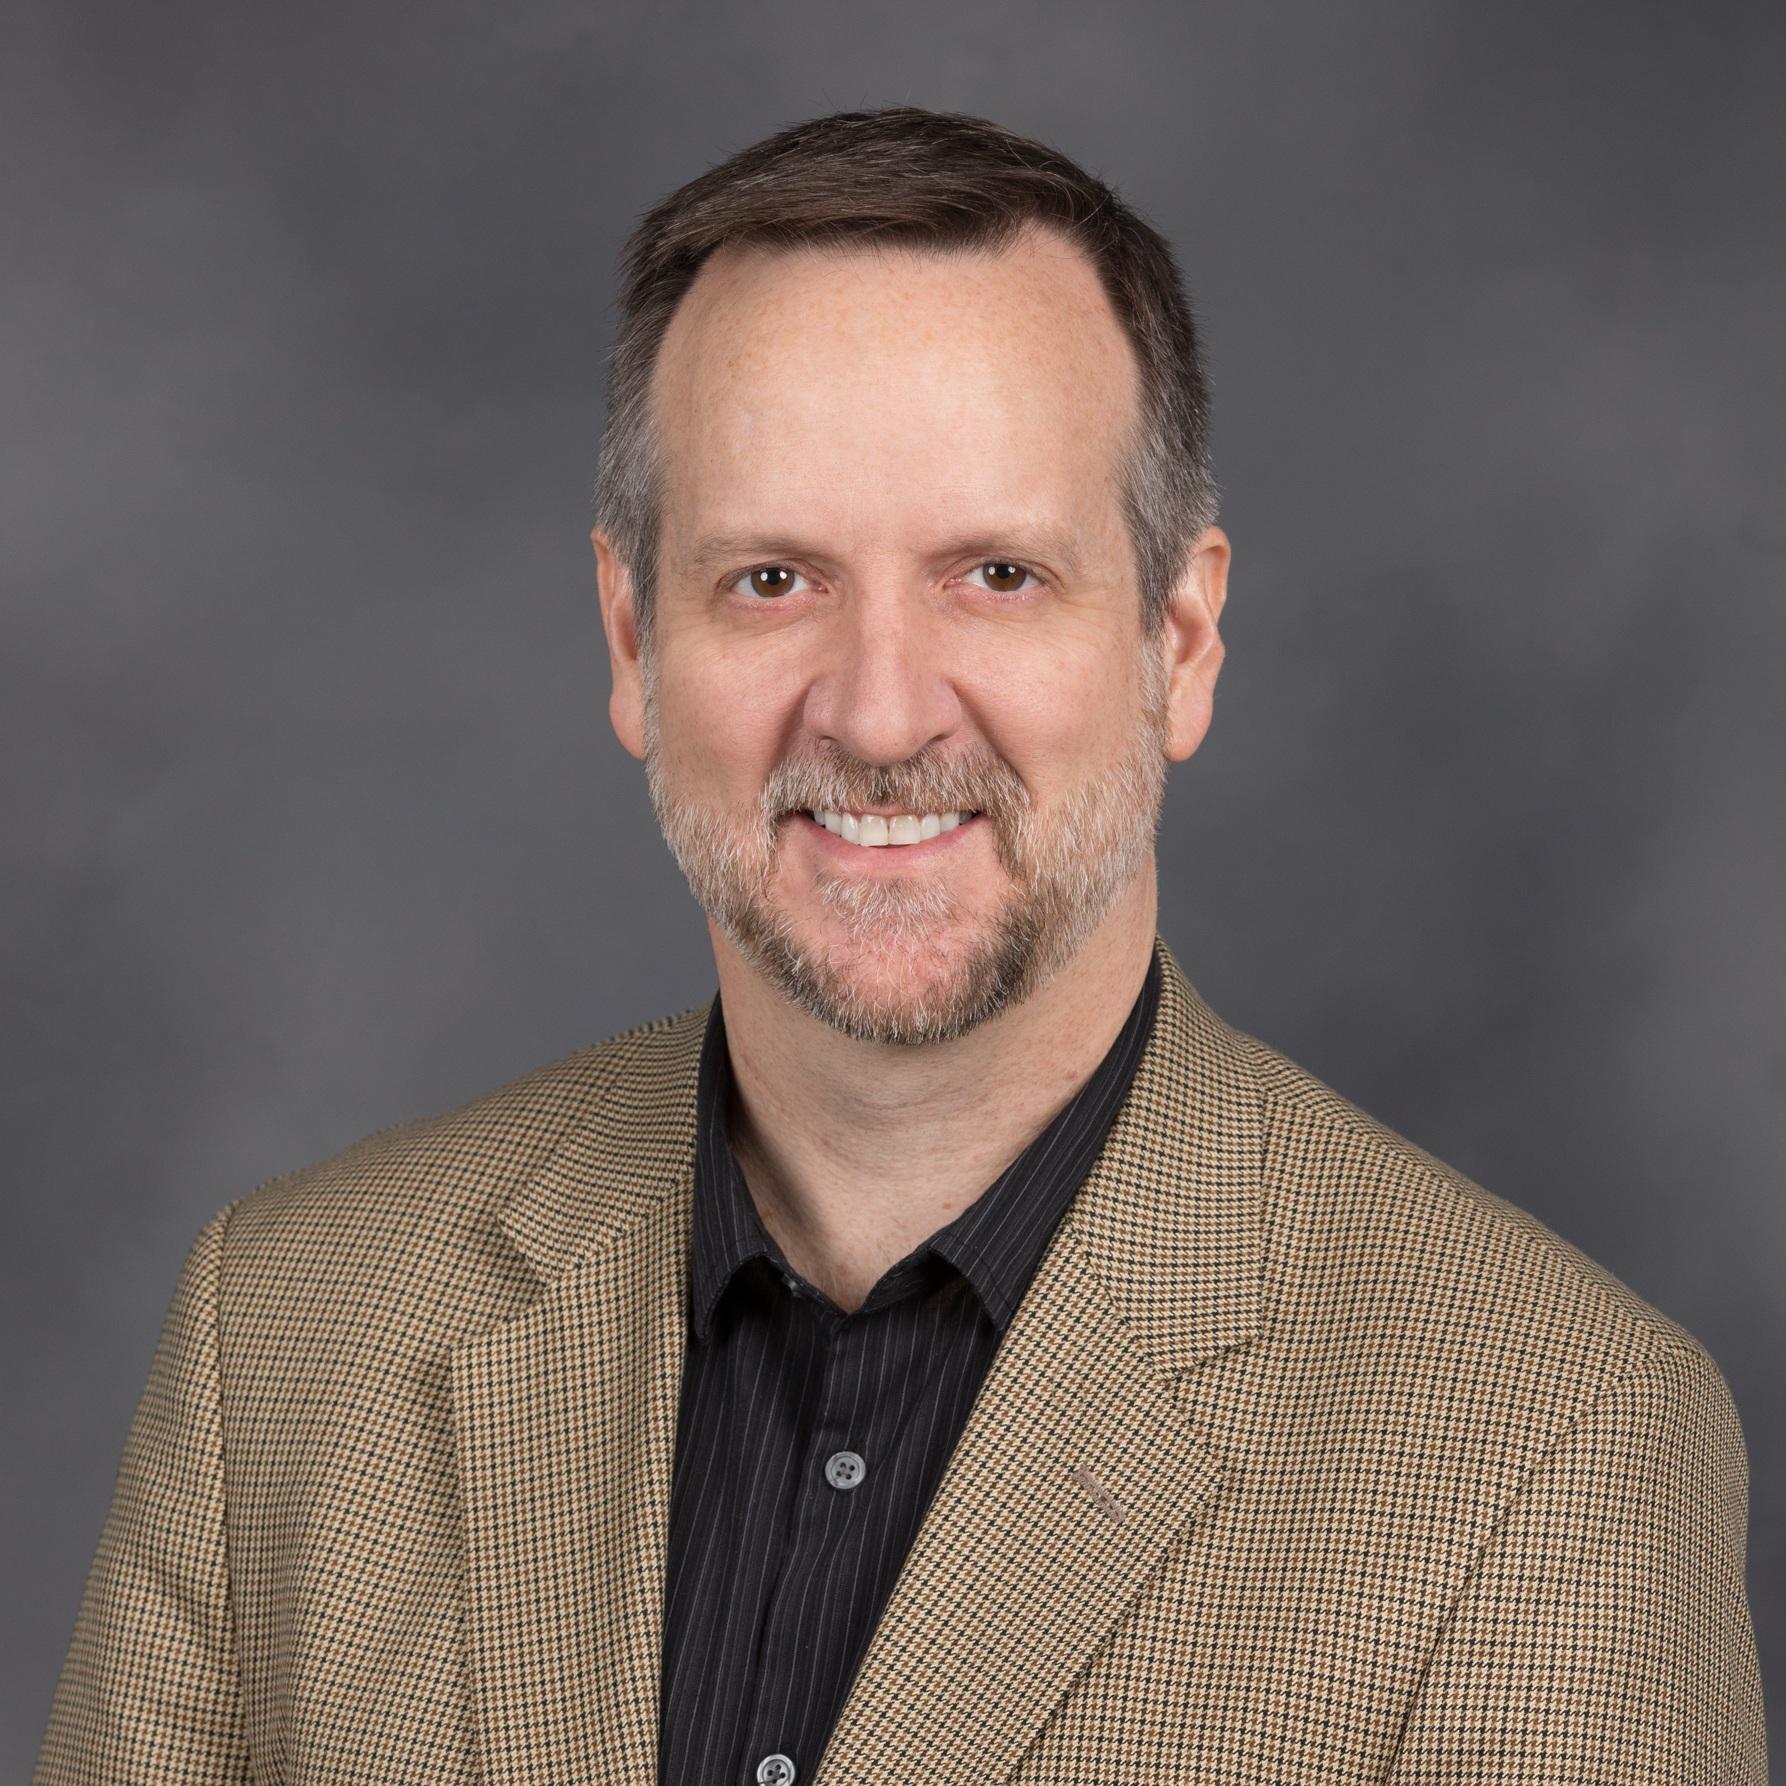 Matthew Wicks, PE - VP Product Development Honeywell